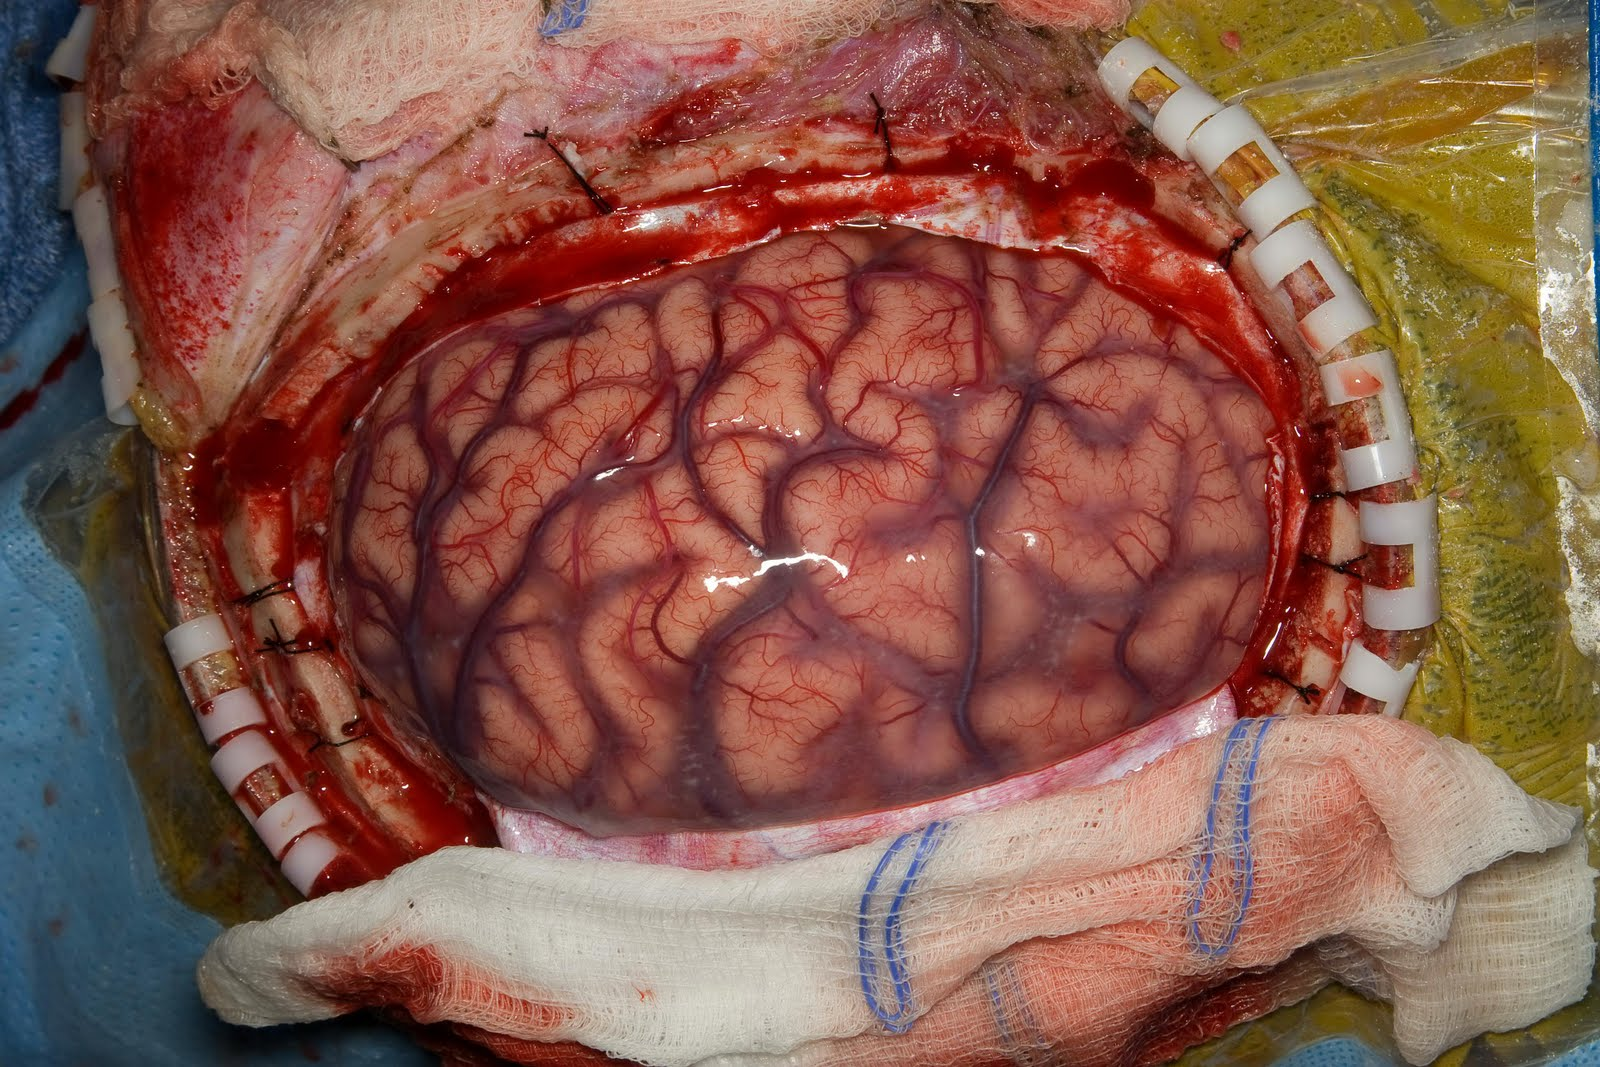 brain surgery - photo #7